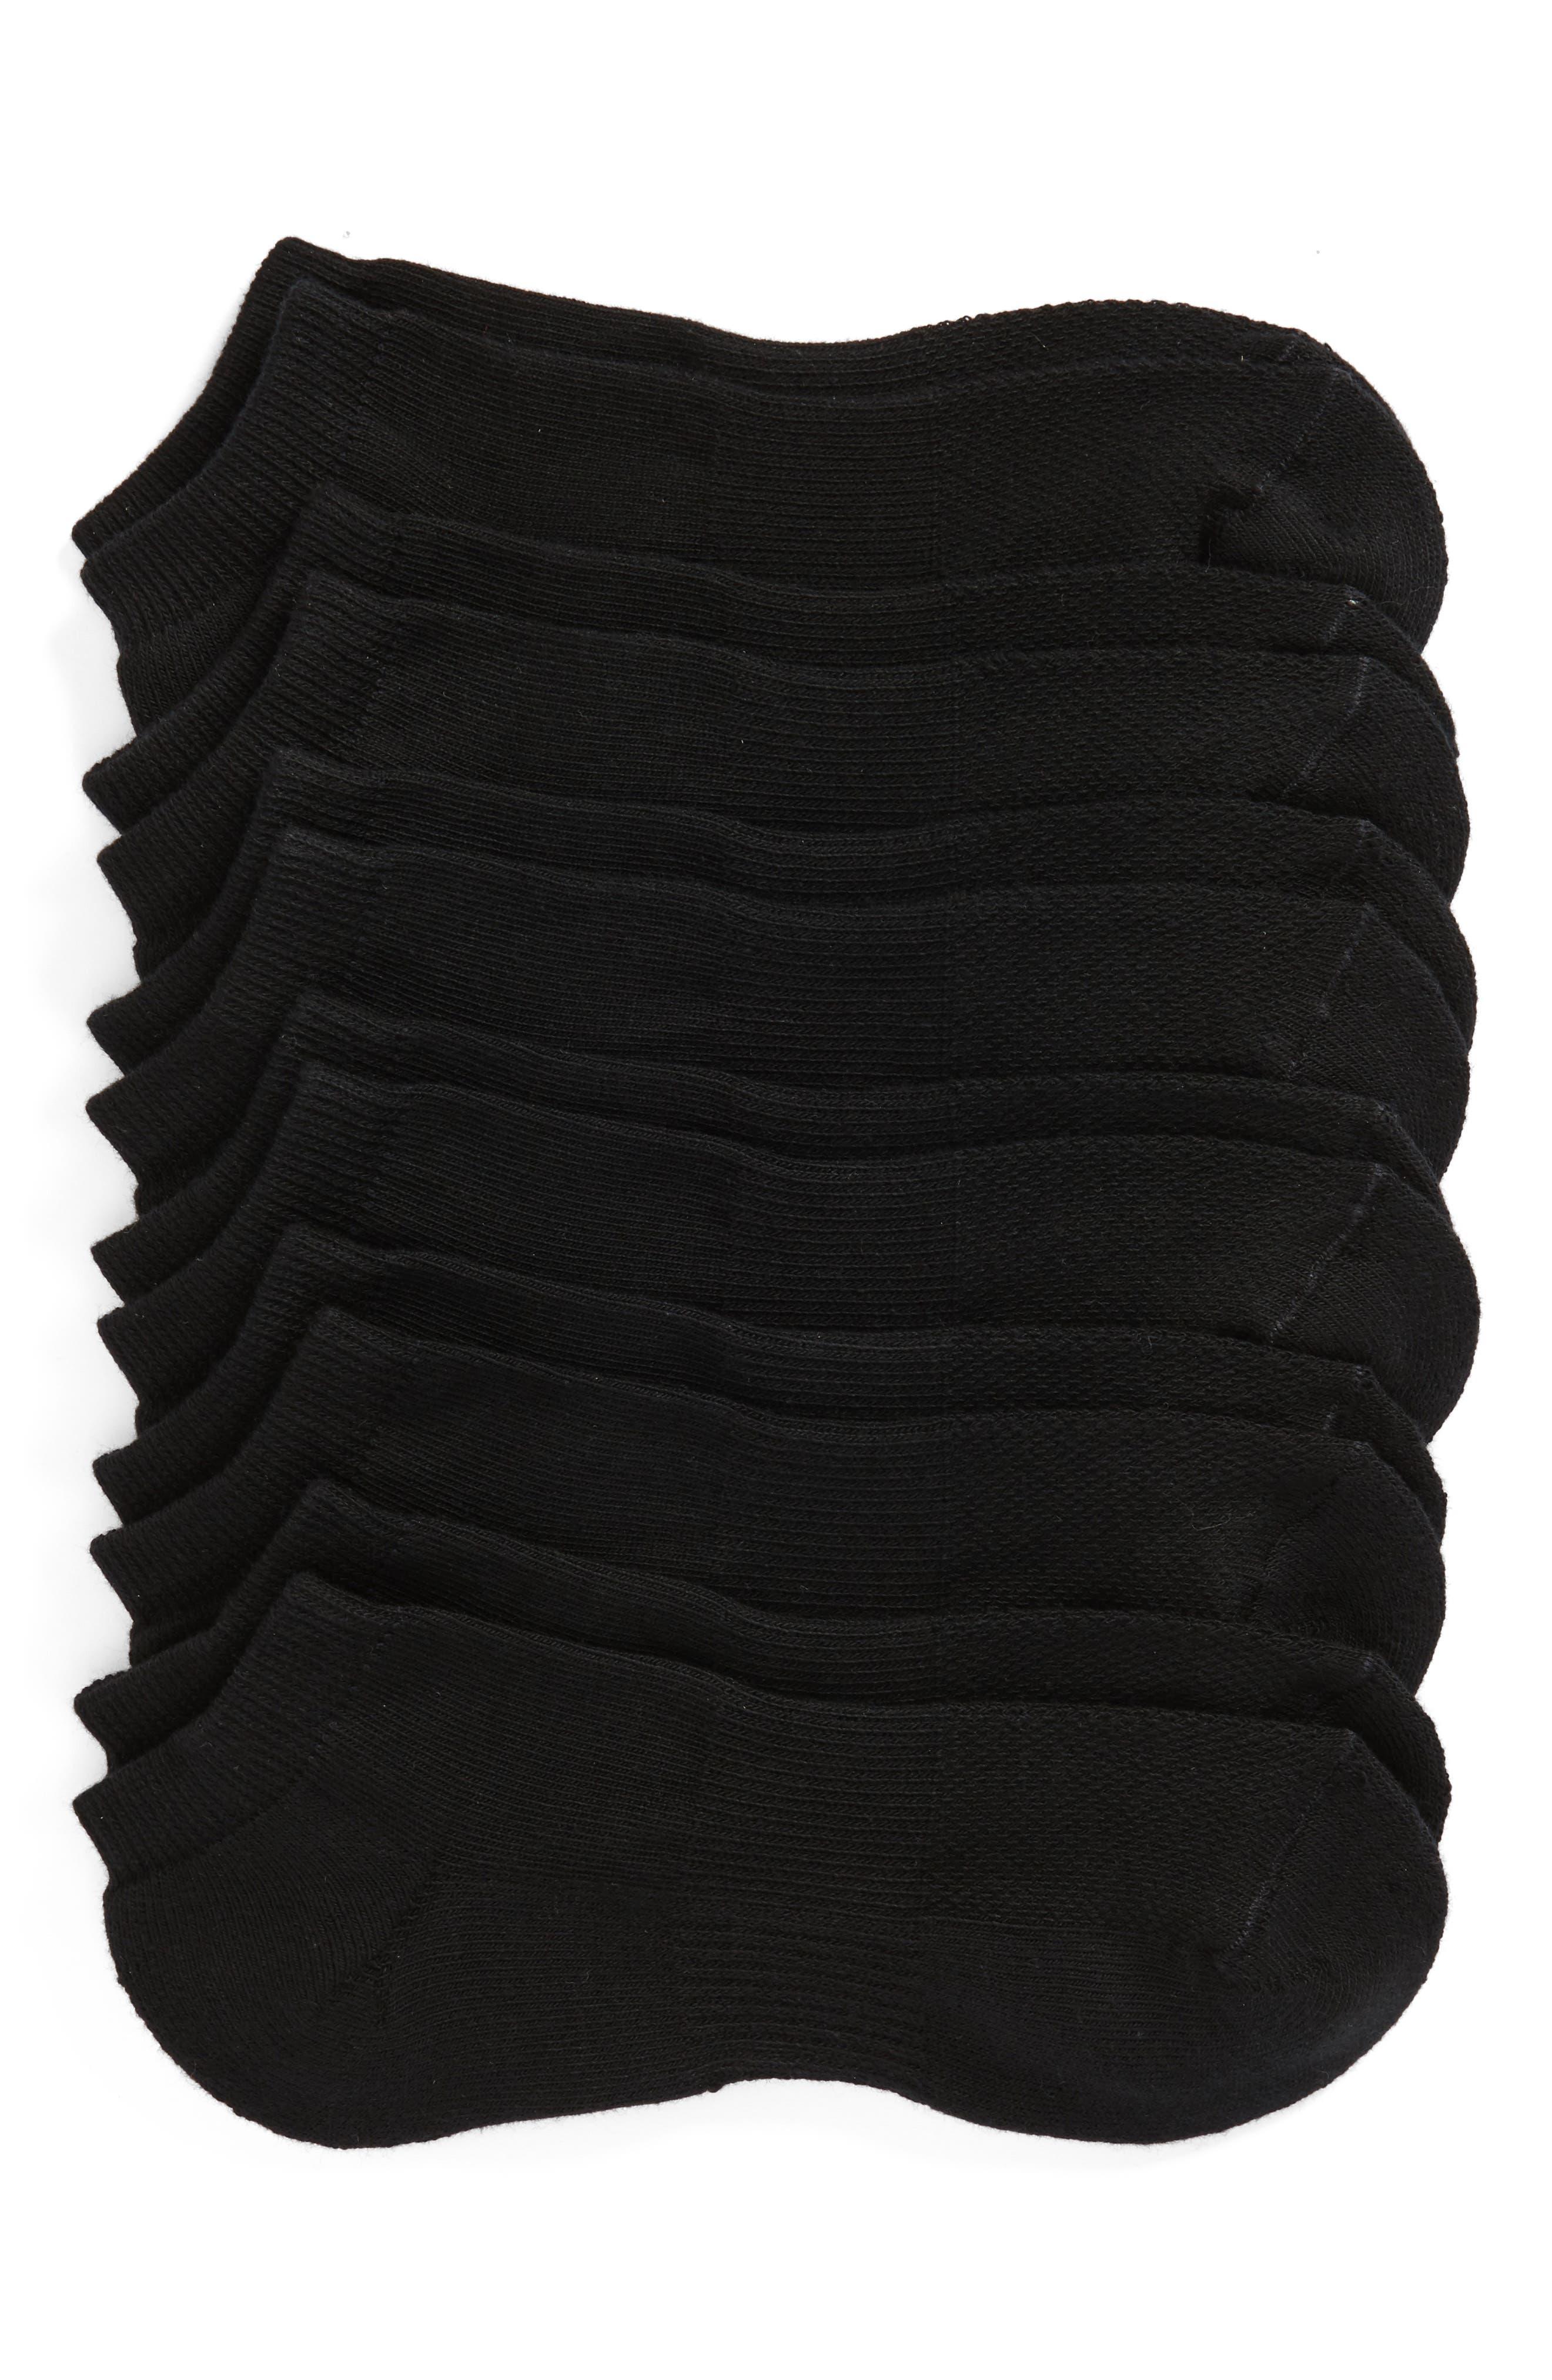 Main Image - Nordstrom Men's Shop 6-Pack Athletic No-Show Socks